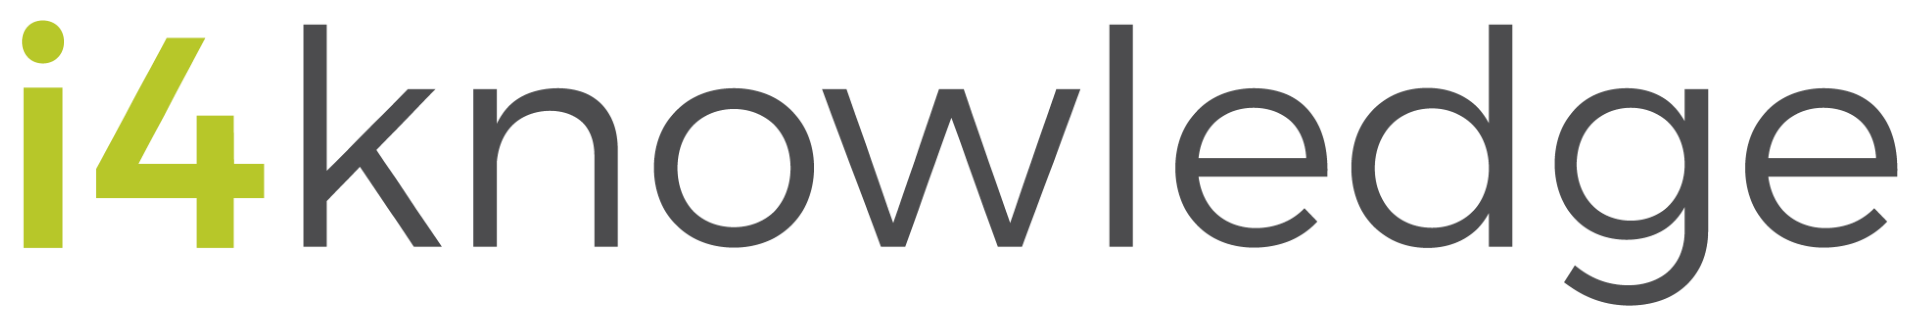 logo i4knowledge